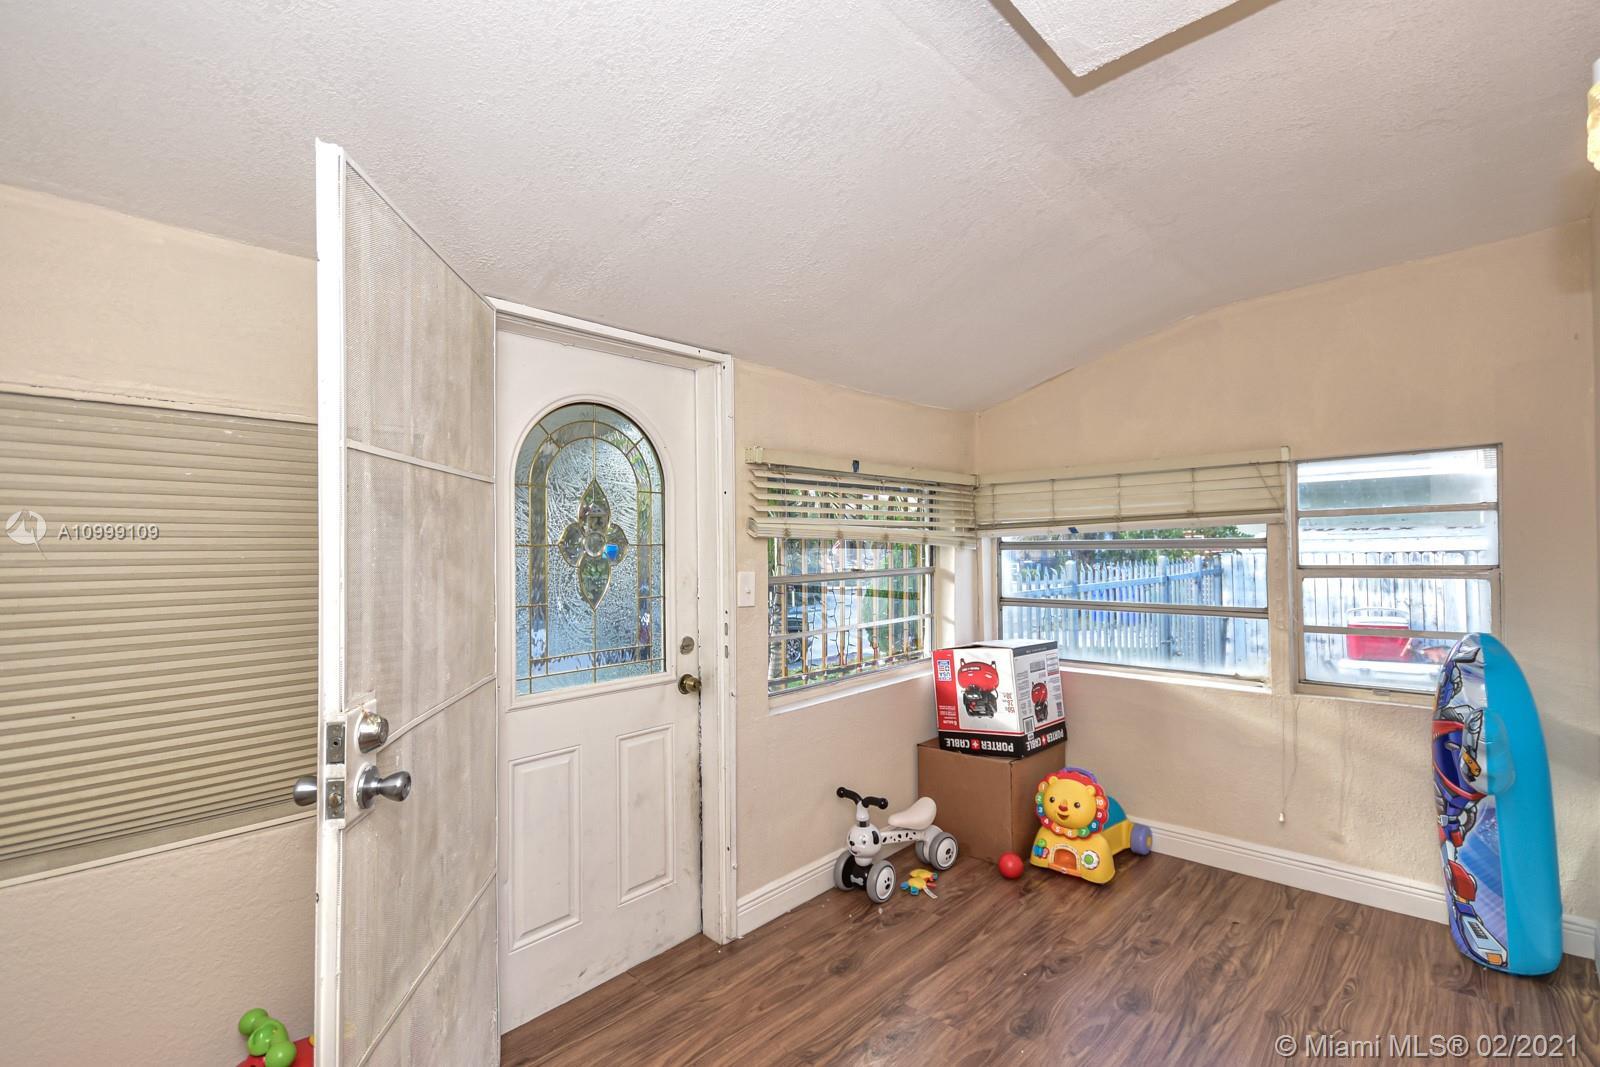 /  2031 sq. ft. $ 2021-02-23 0 Photo